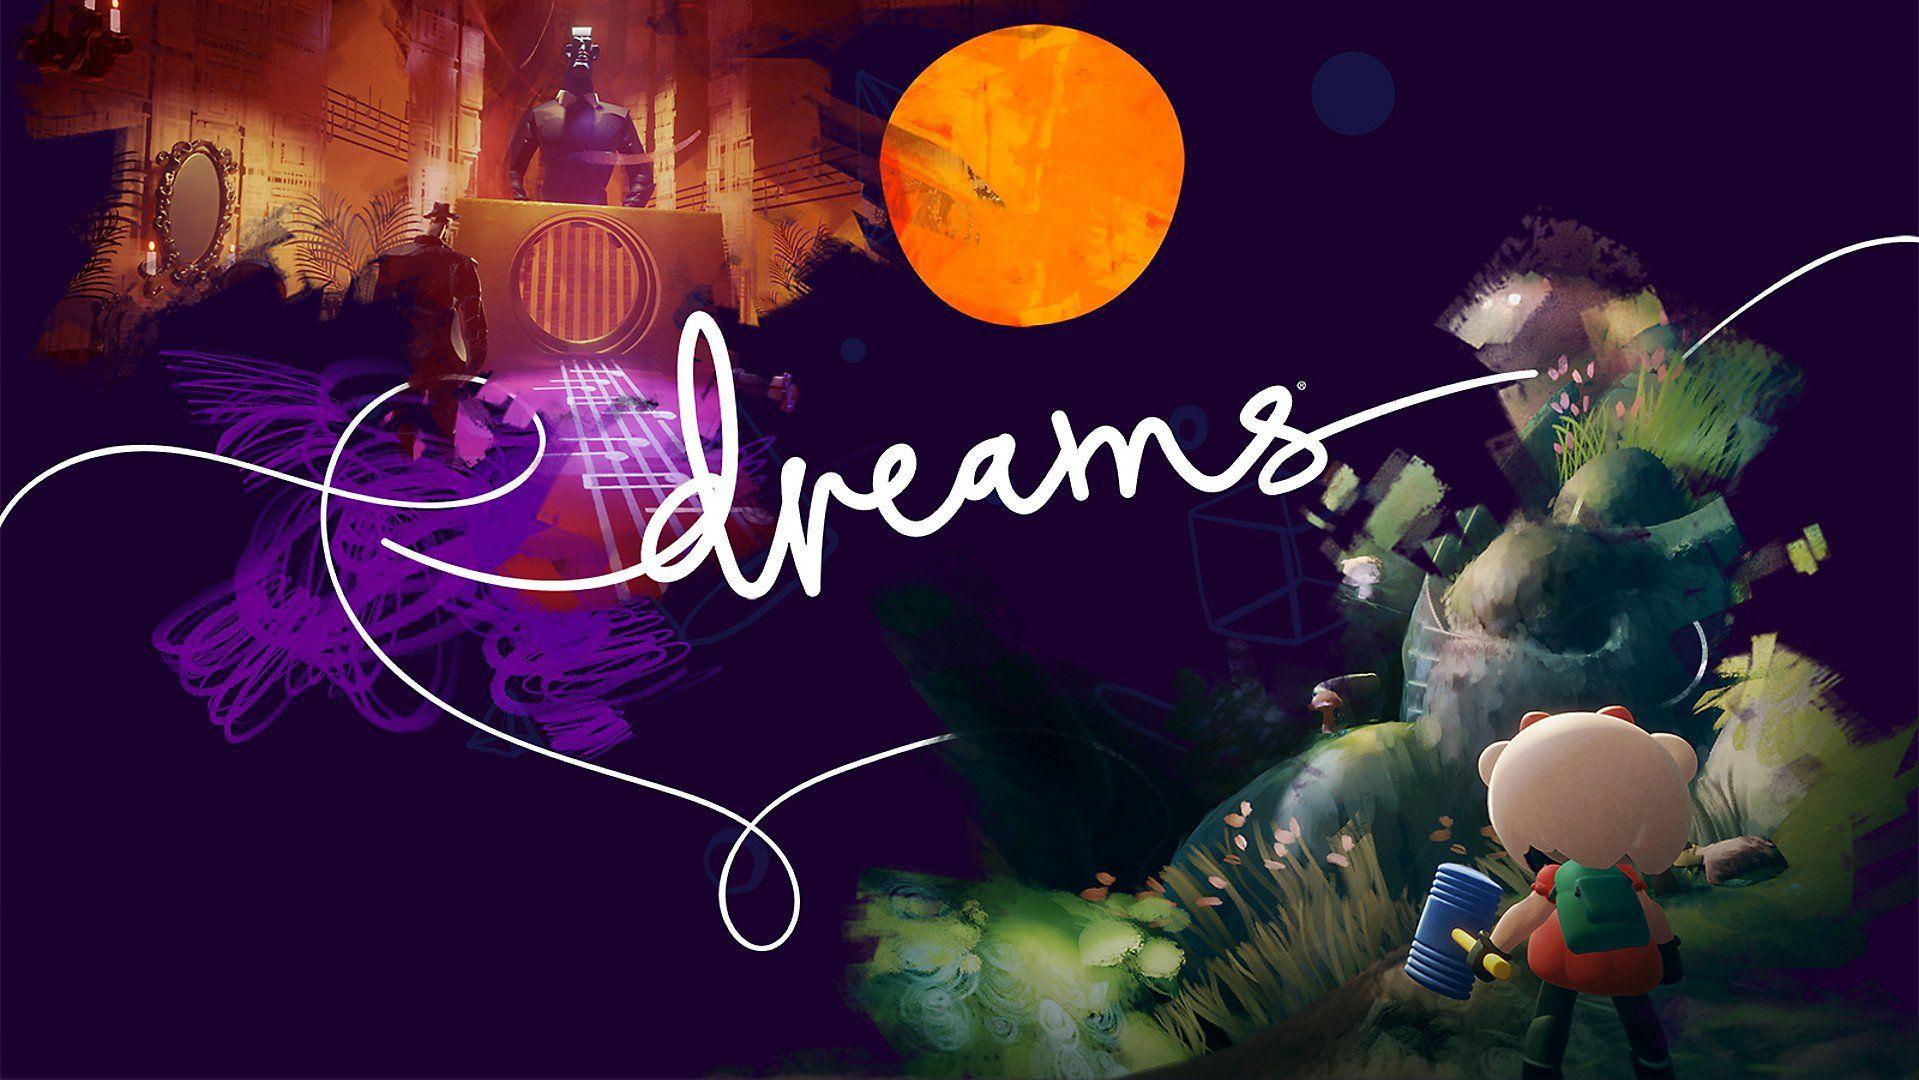 Media Molecule Exploring Non Motion Controls For Dreams But Not